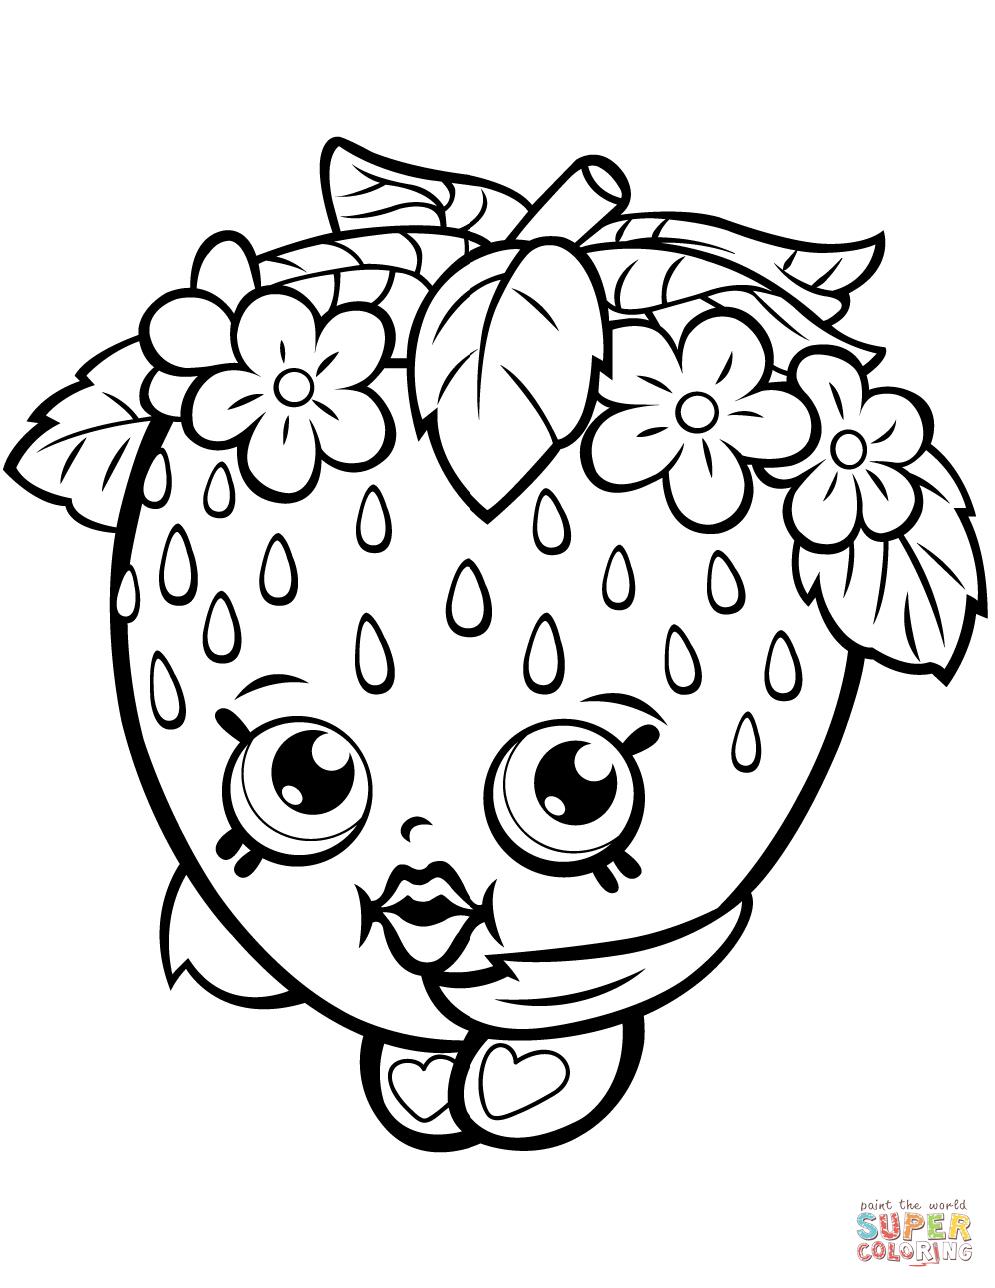 Strawberry Kiss Shopkin Coloring Page   Free Printable Coloring - Shopkins Coloring Pages Free Printable